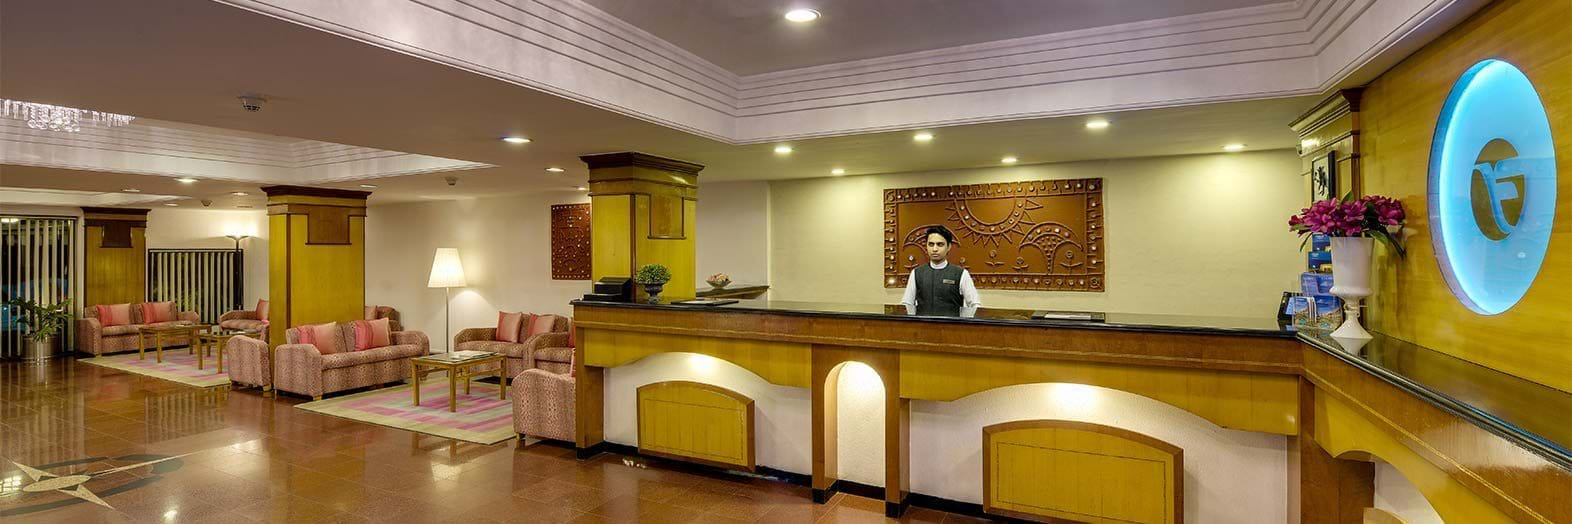 Hotels in Vapi - Fortune Park Galaxy